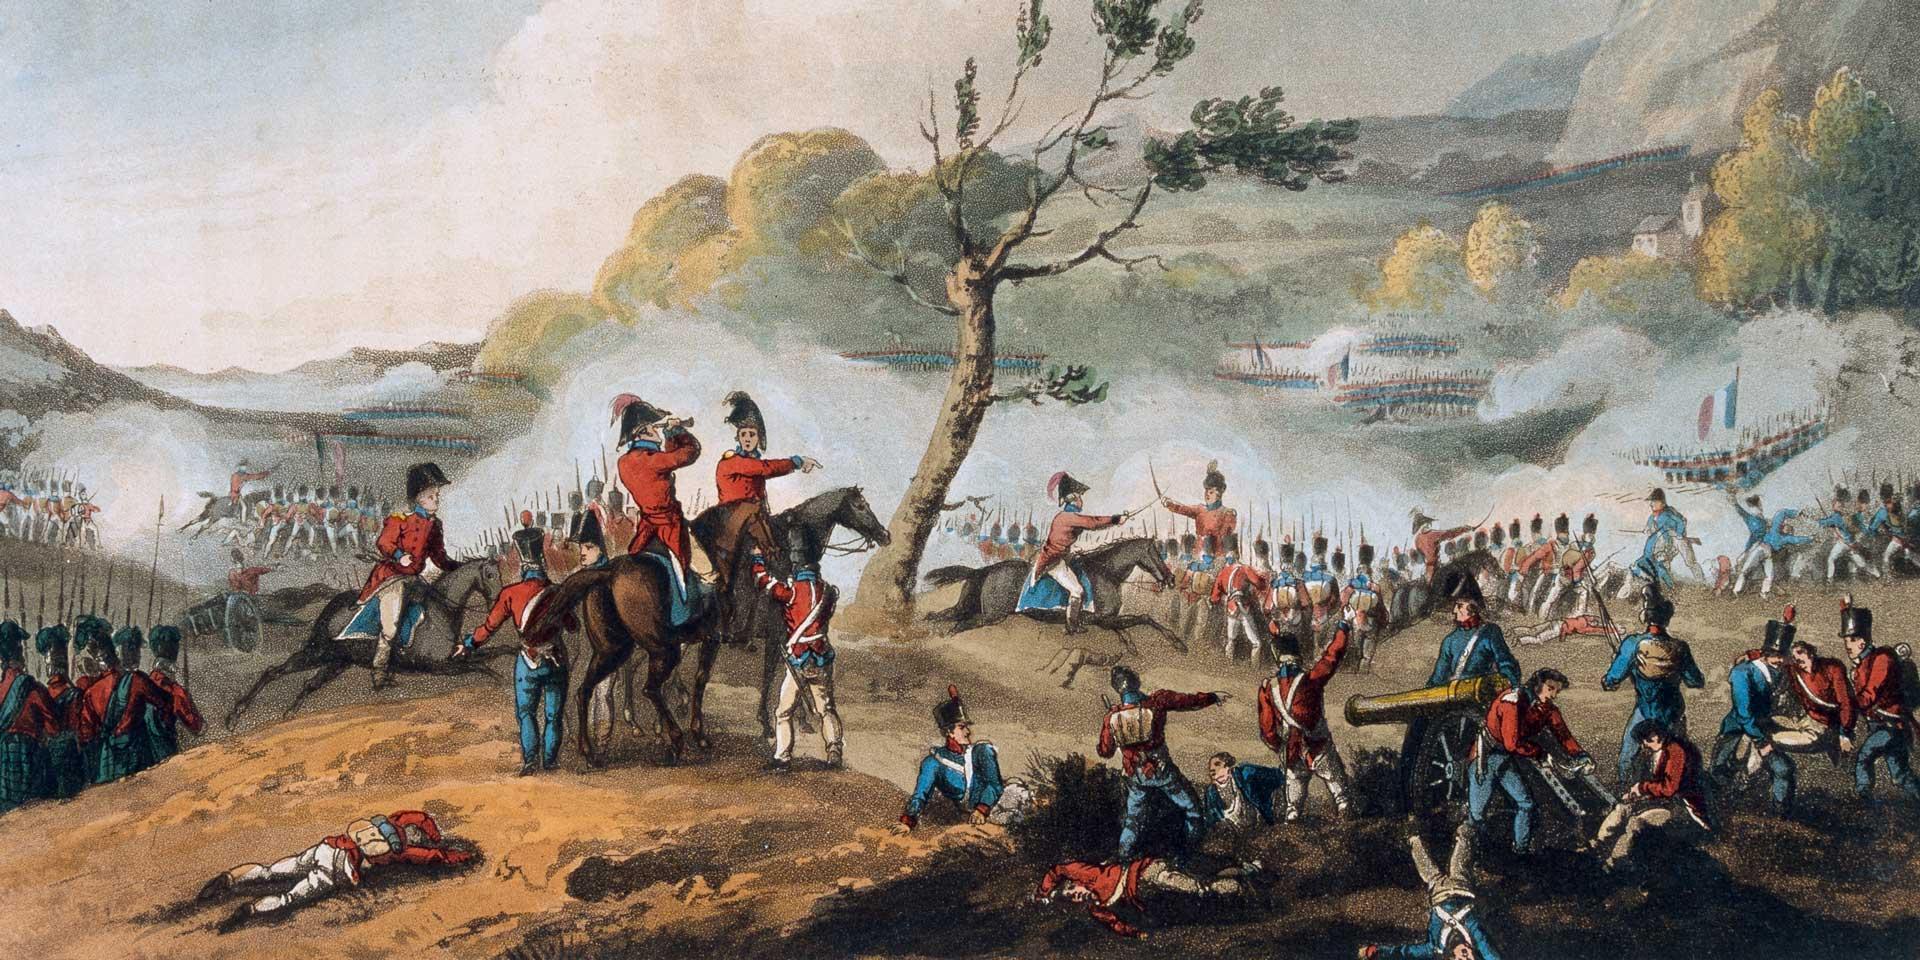 The Battle of Maida, 4 July 1806